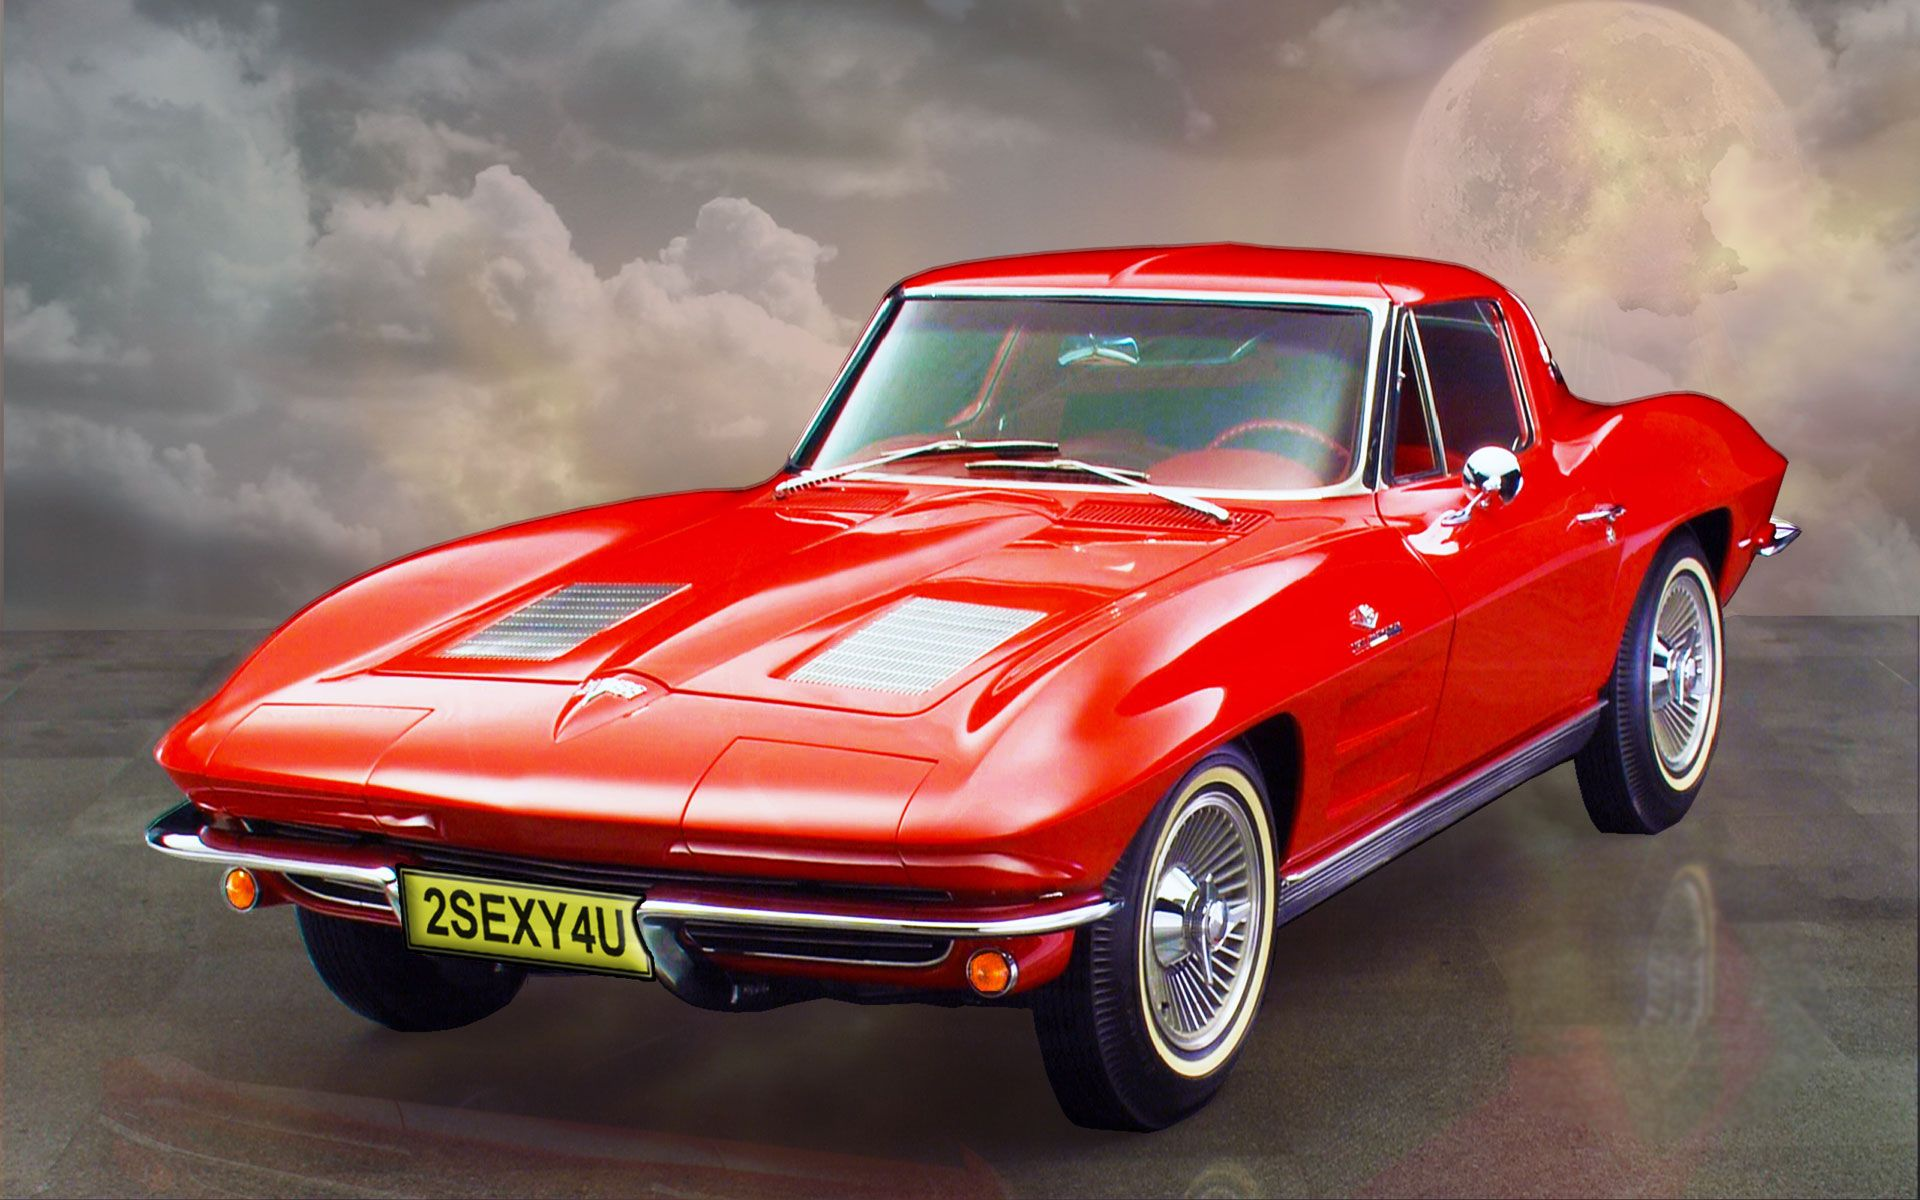 1963 chevy corvette stingray in red